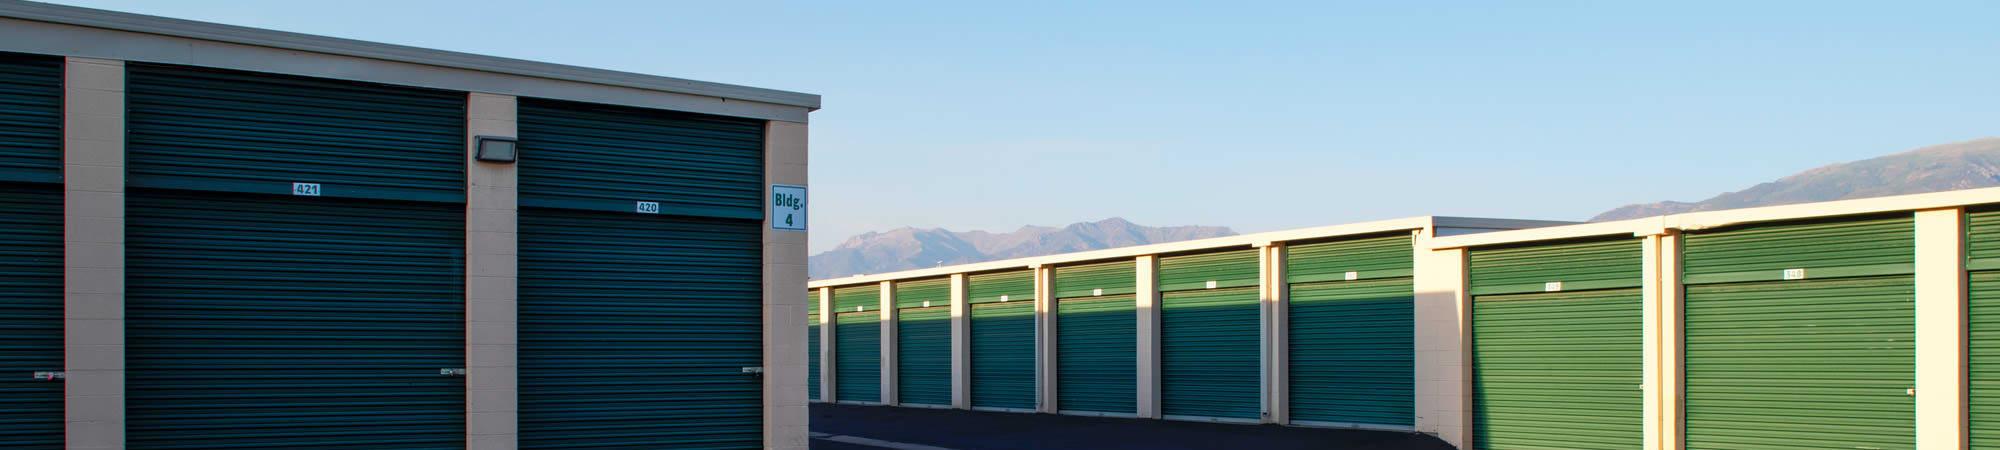 Lock It Up Self Storage self storage units for rent in Layton, Utah